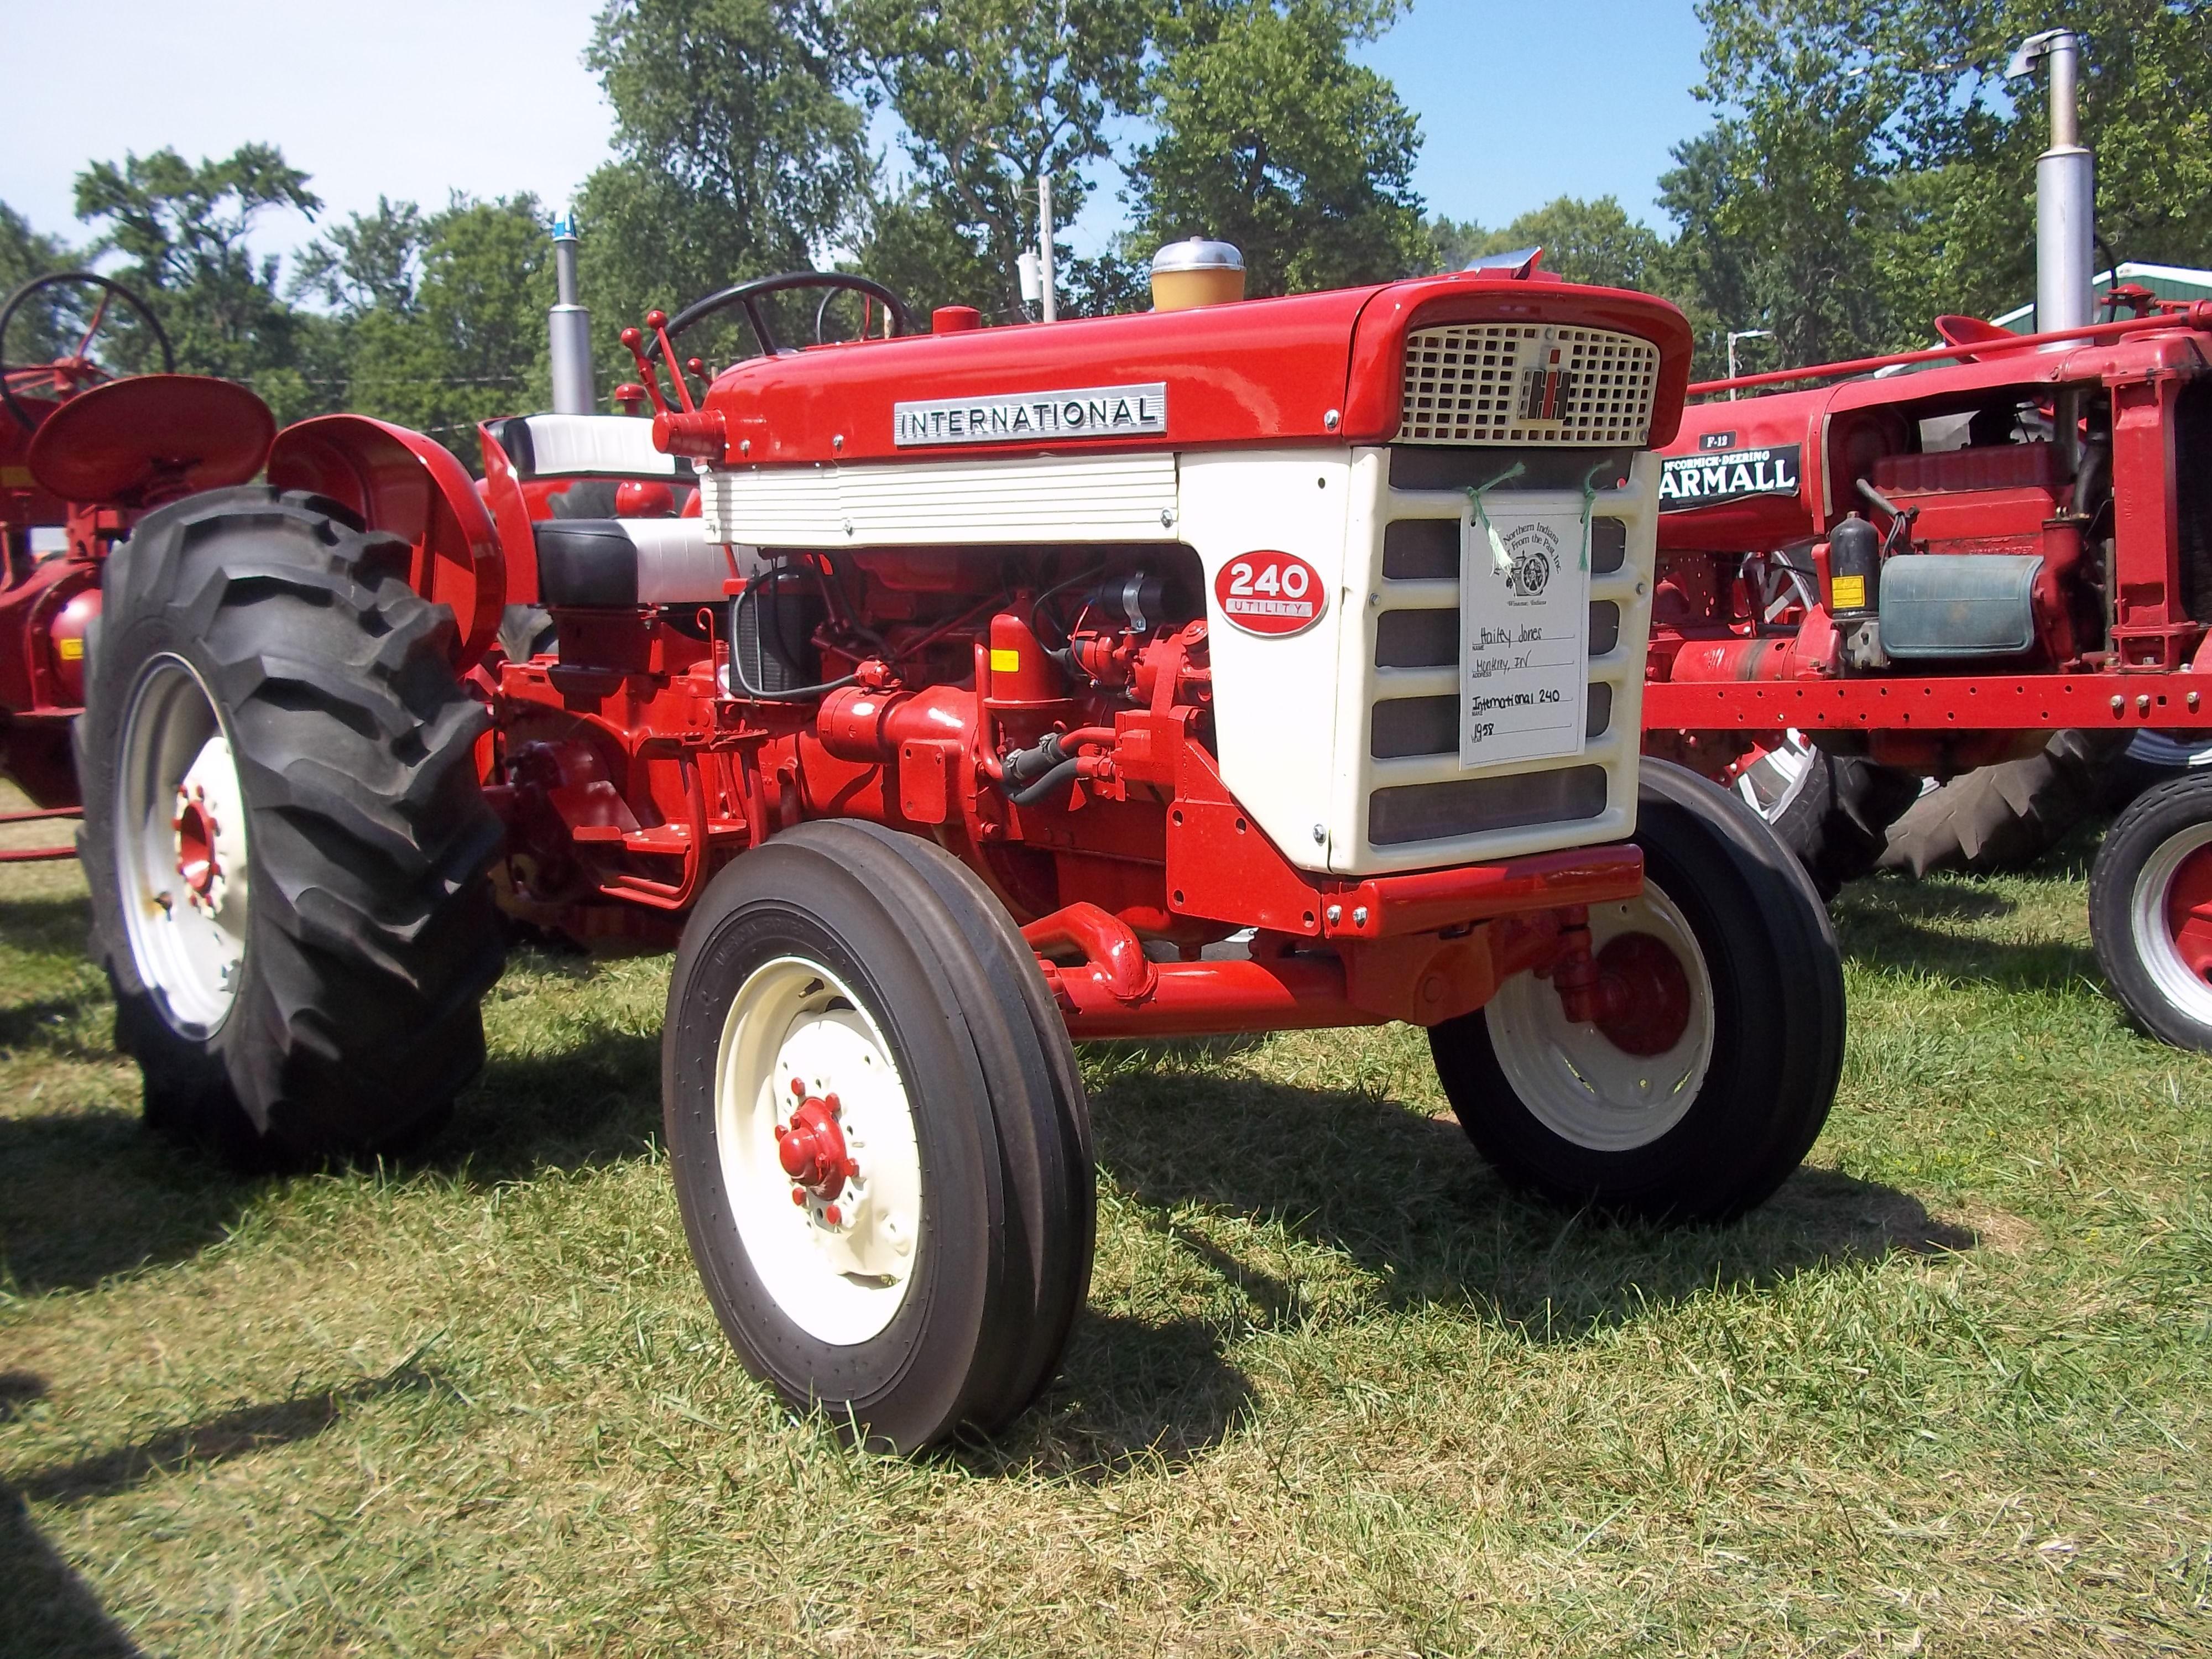 1958 International Tractor : International harvester pinterest